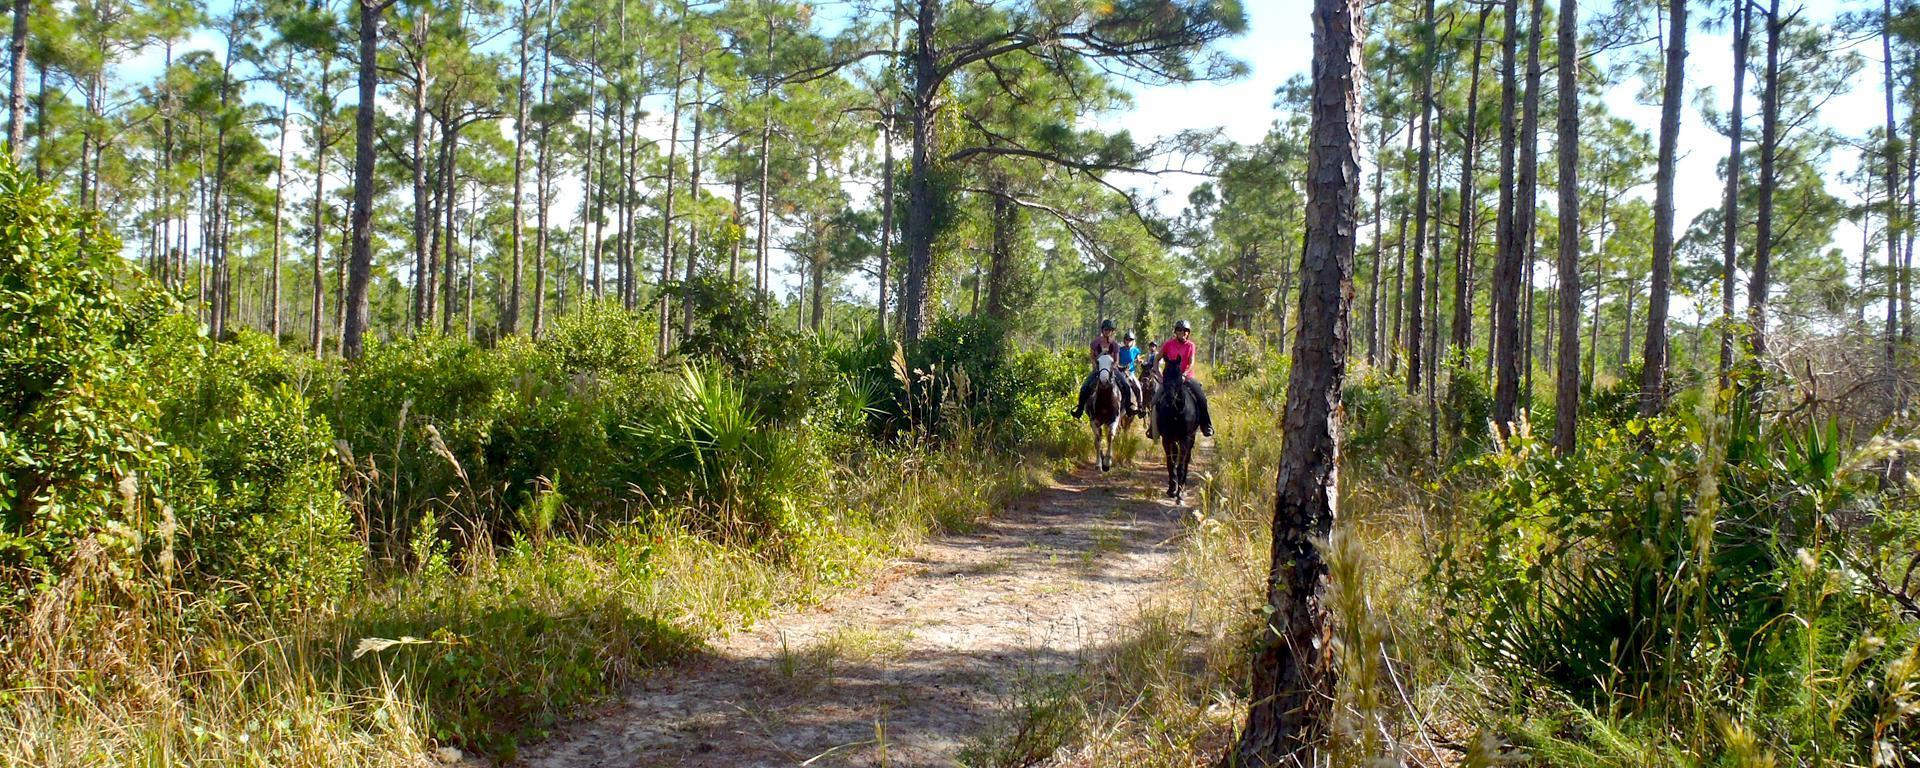 Riders on horseback along a trail at Pal Mar East